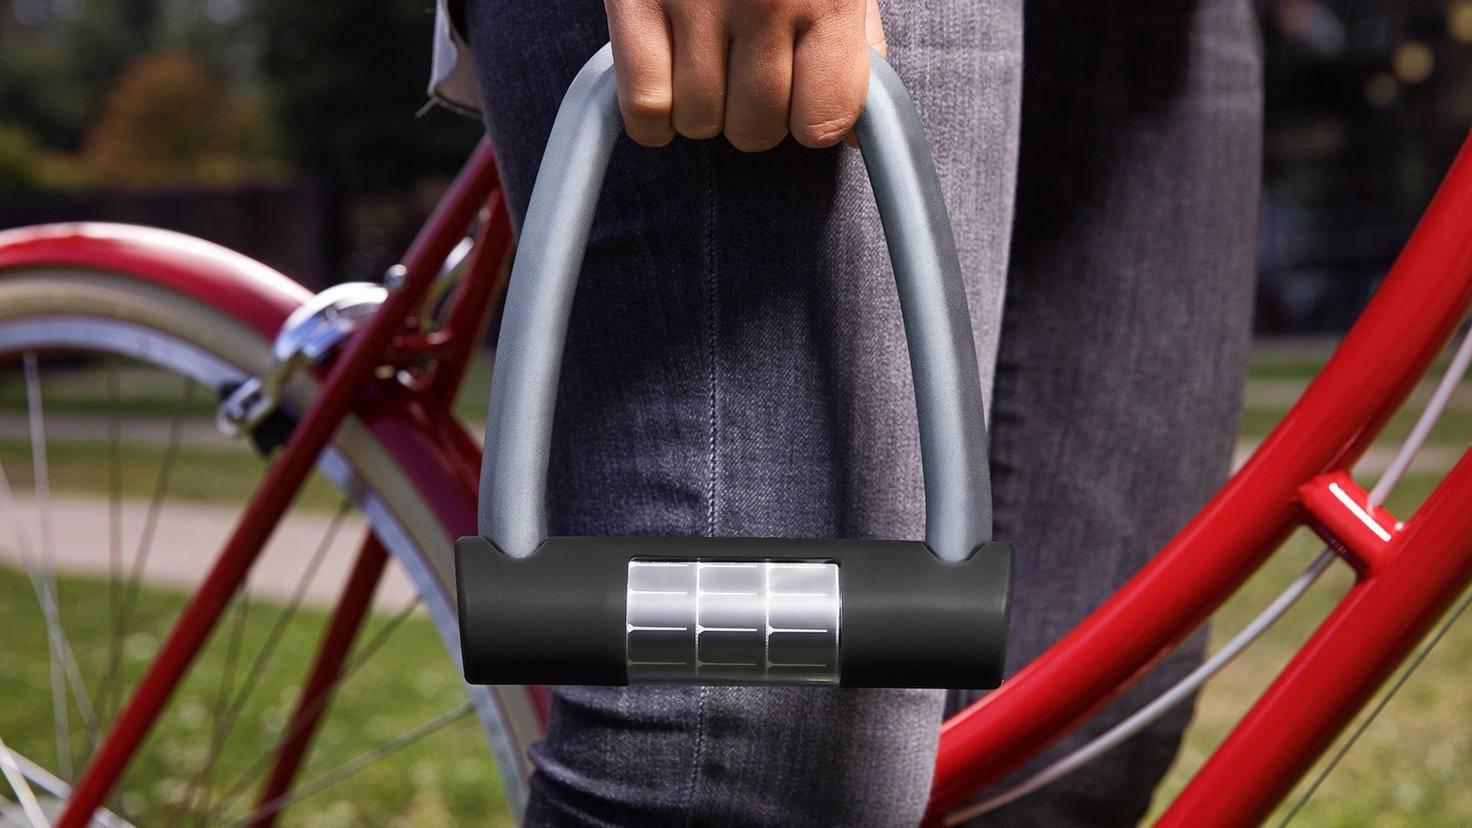 Ellipse smartes Fahrradschloss